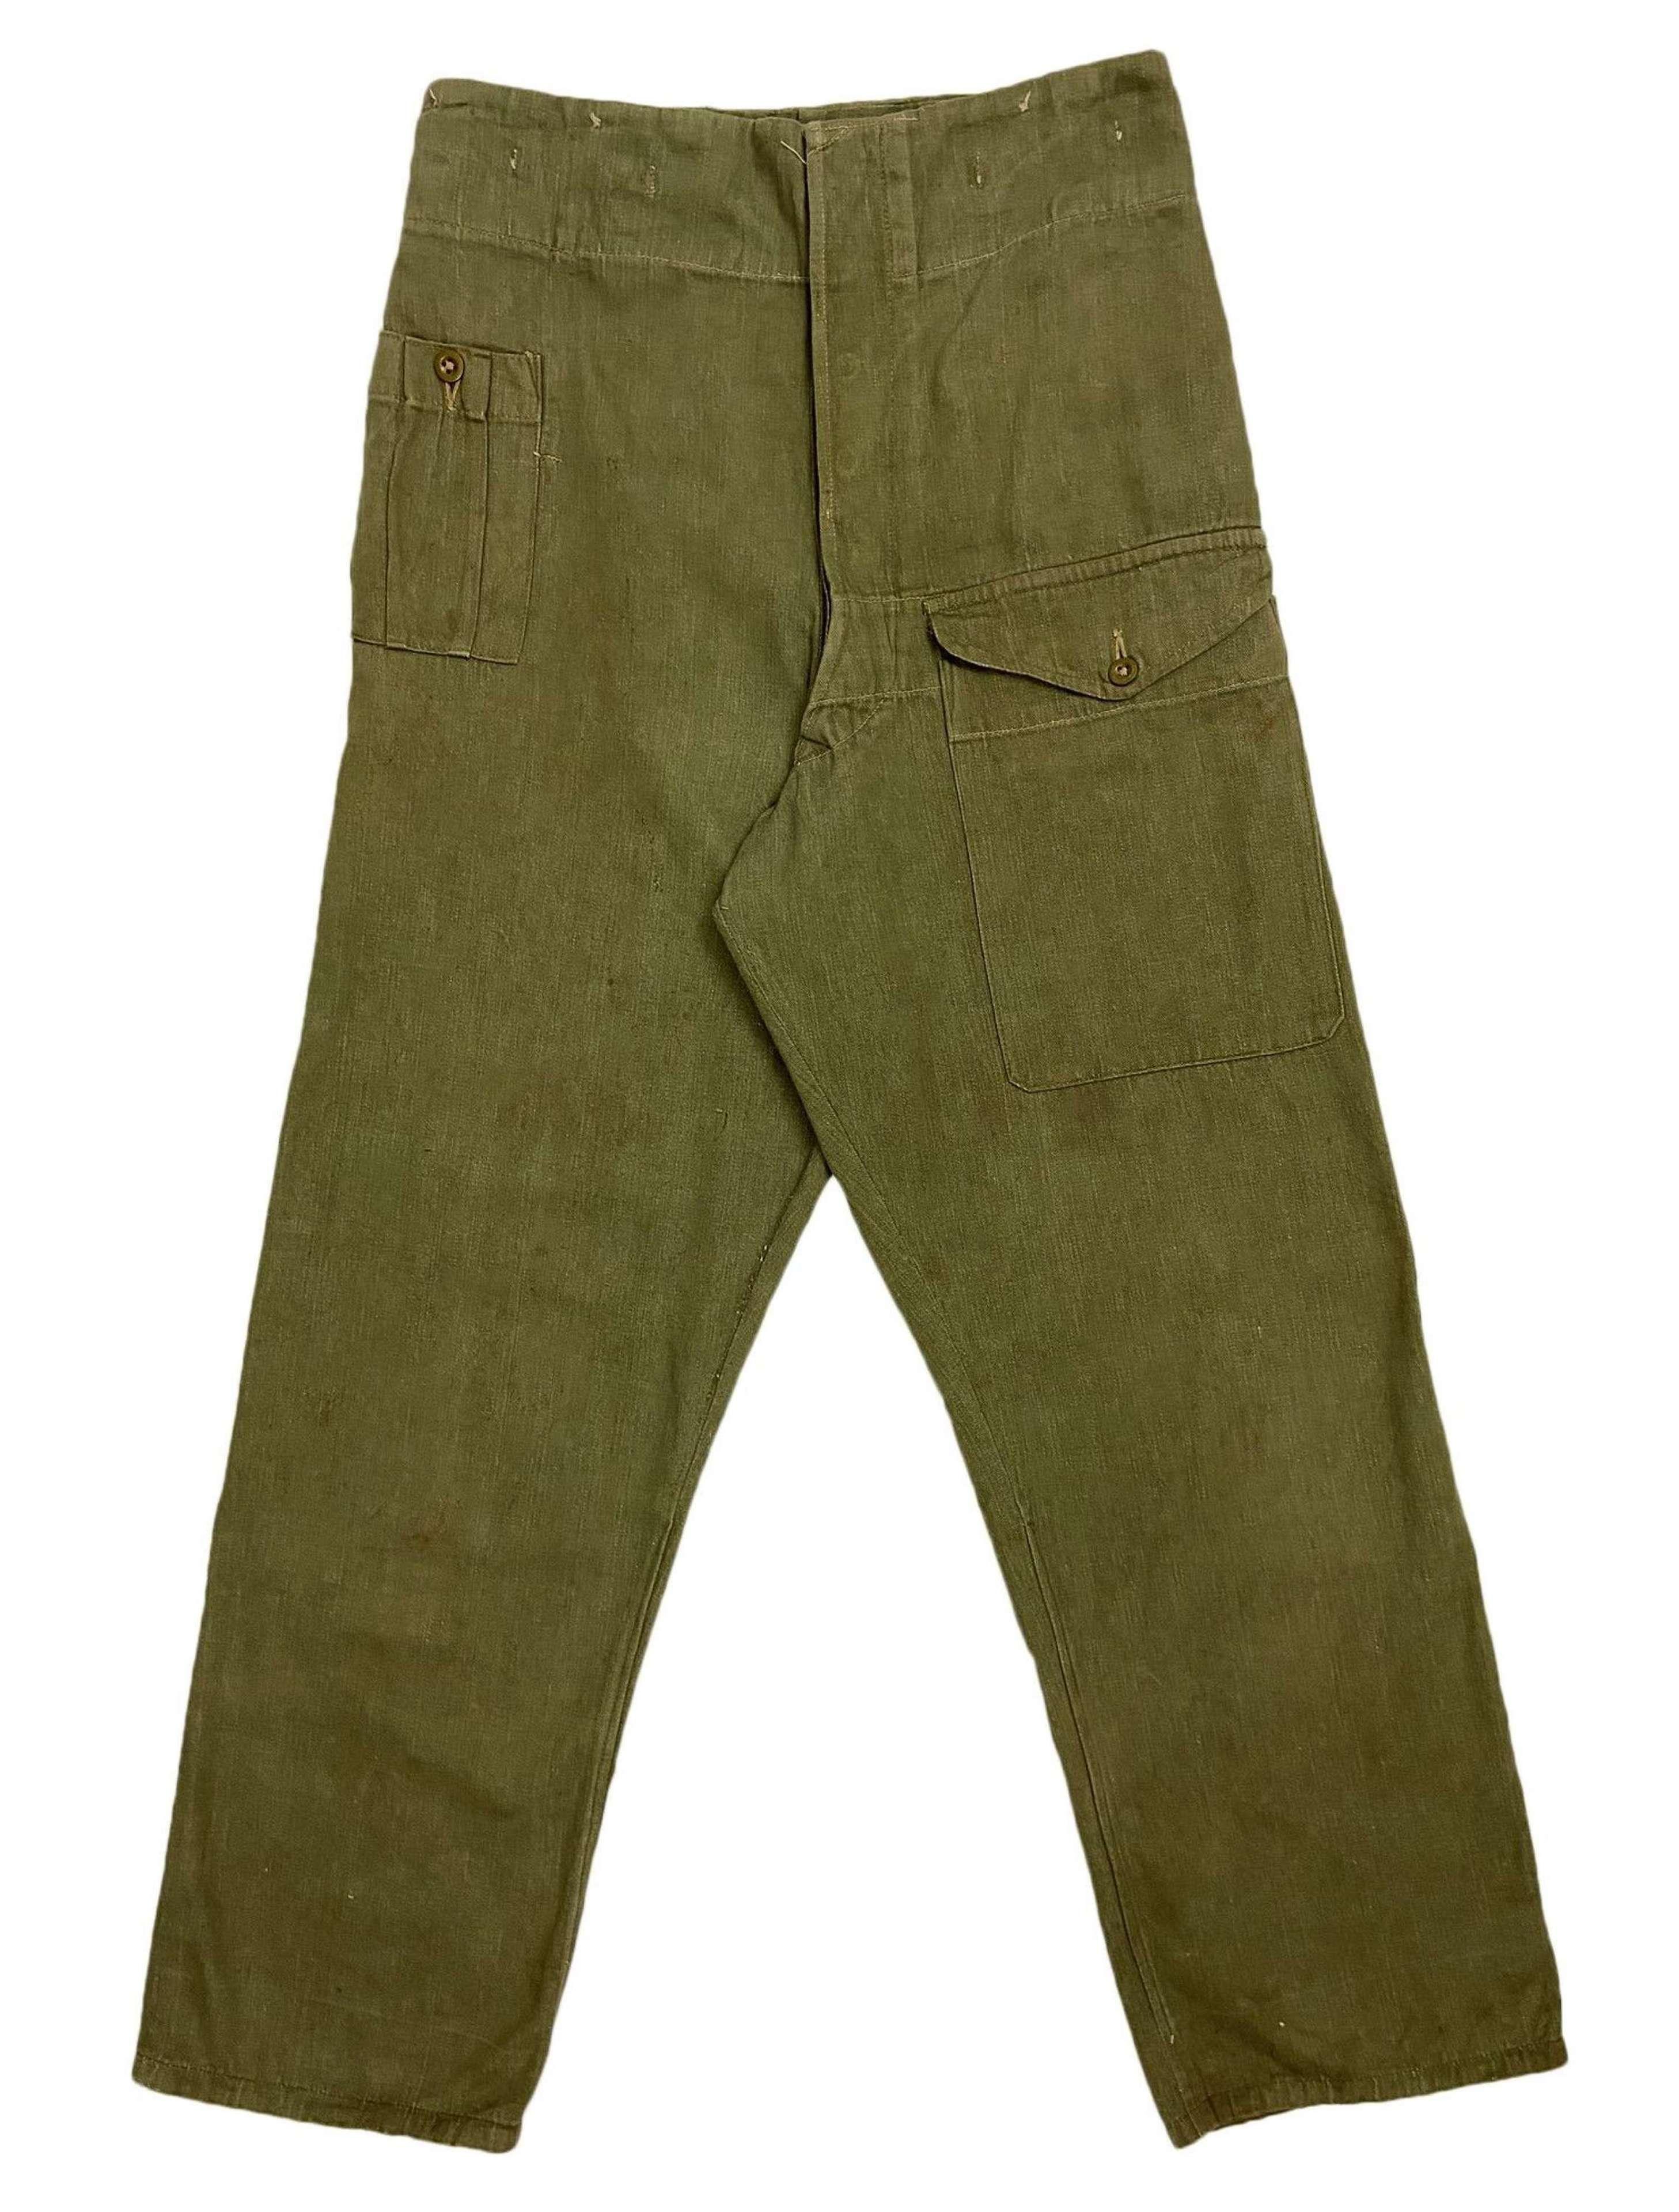 Original British Army Denim Battledress Trousers